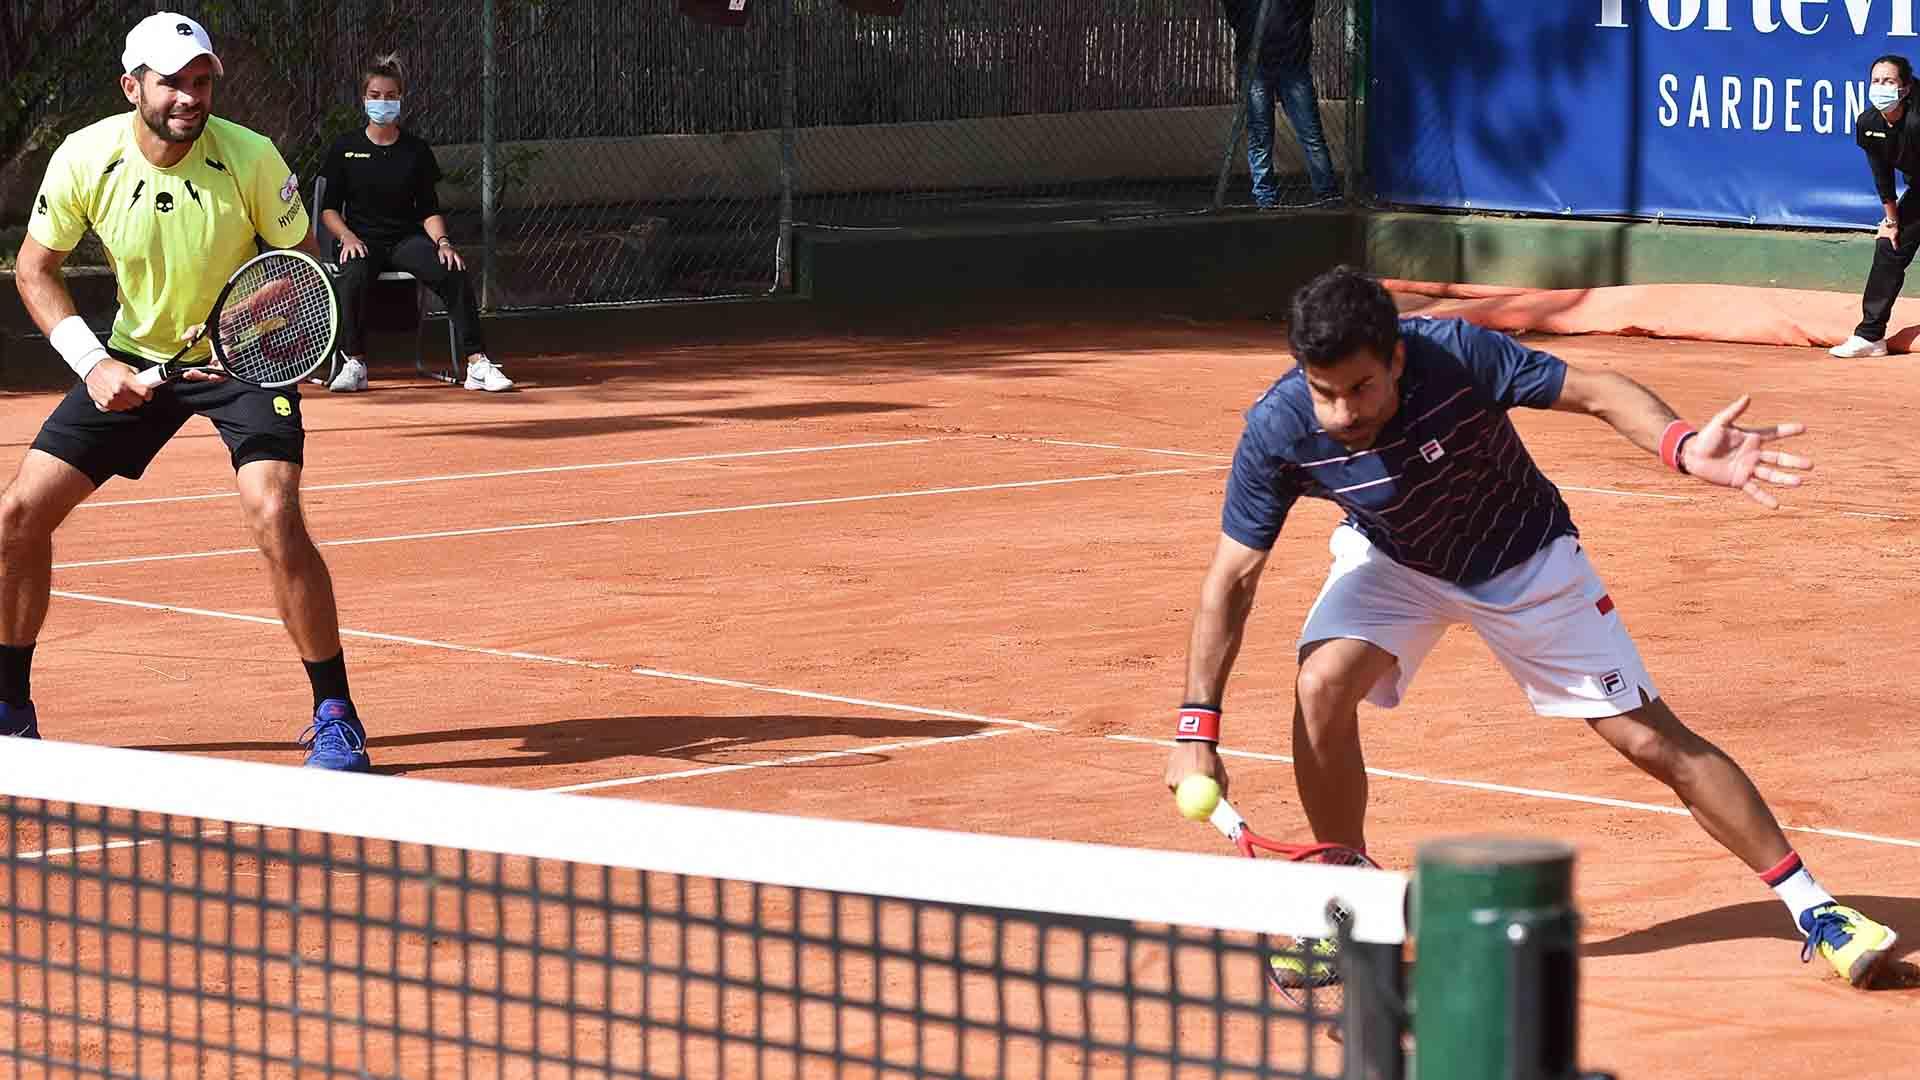 Simone Bolelli and Maximo Gonzalez will face Juan Sebastian Cabal and Robert Farah in the Forte Village Sardegna Open semi-finals.